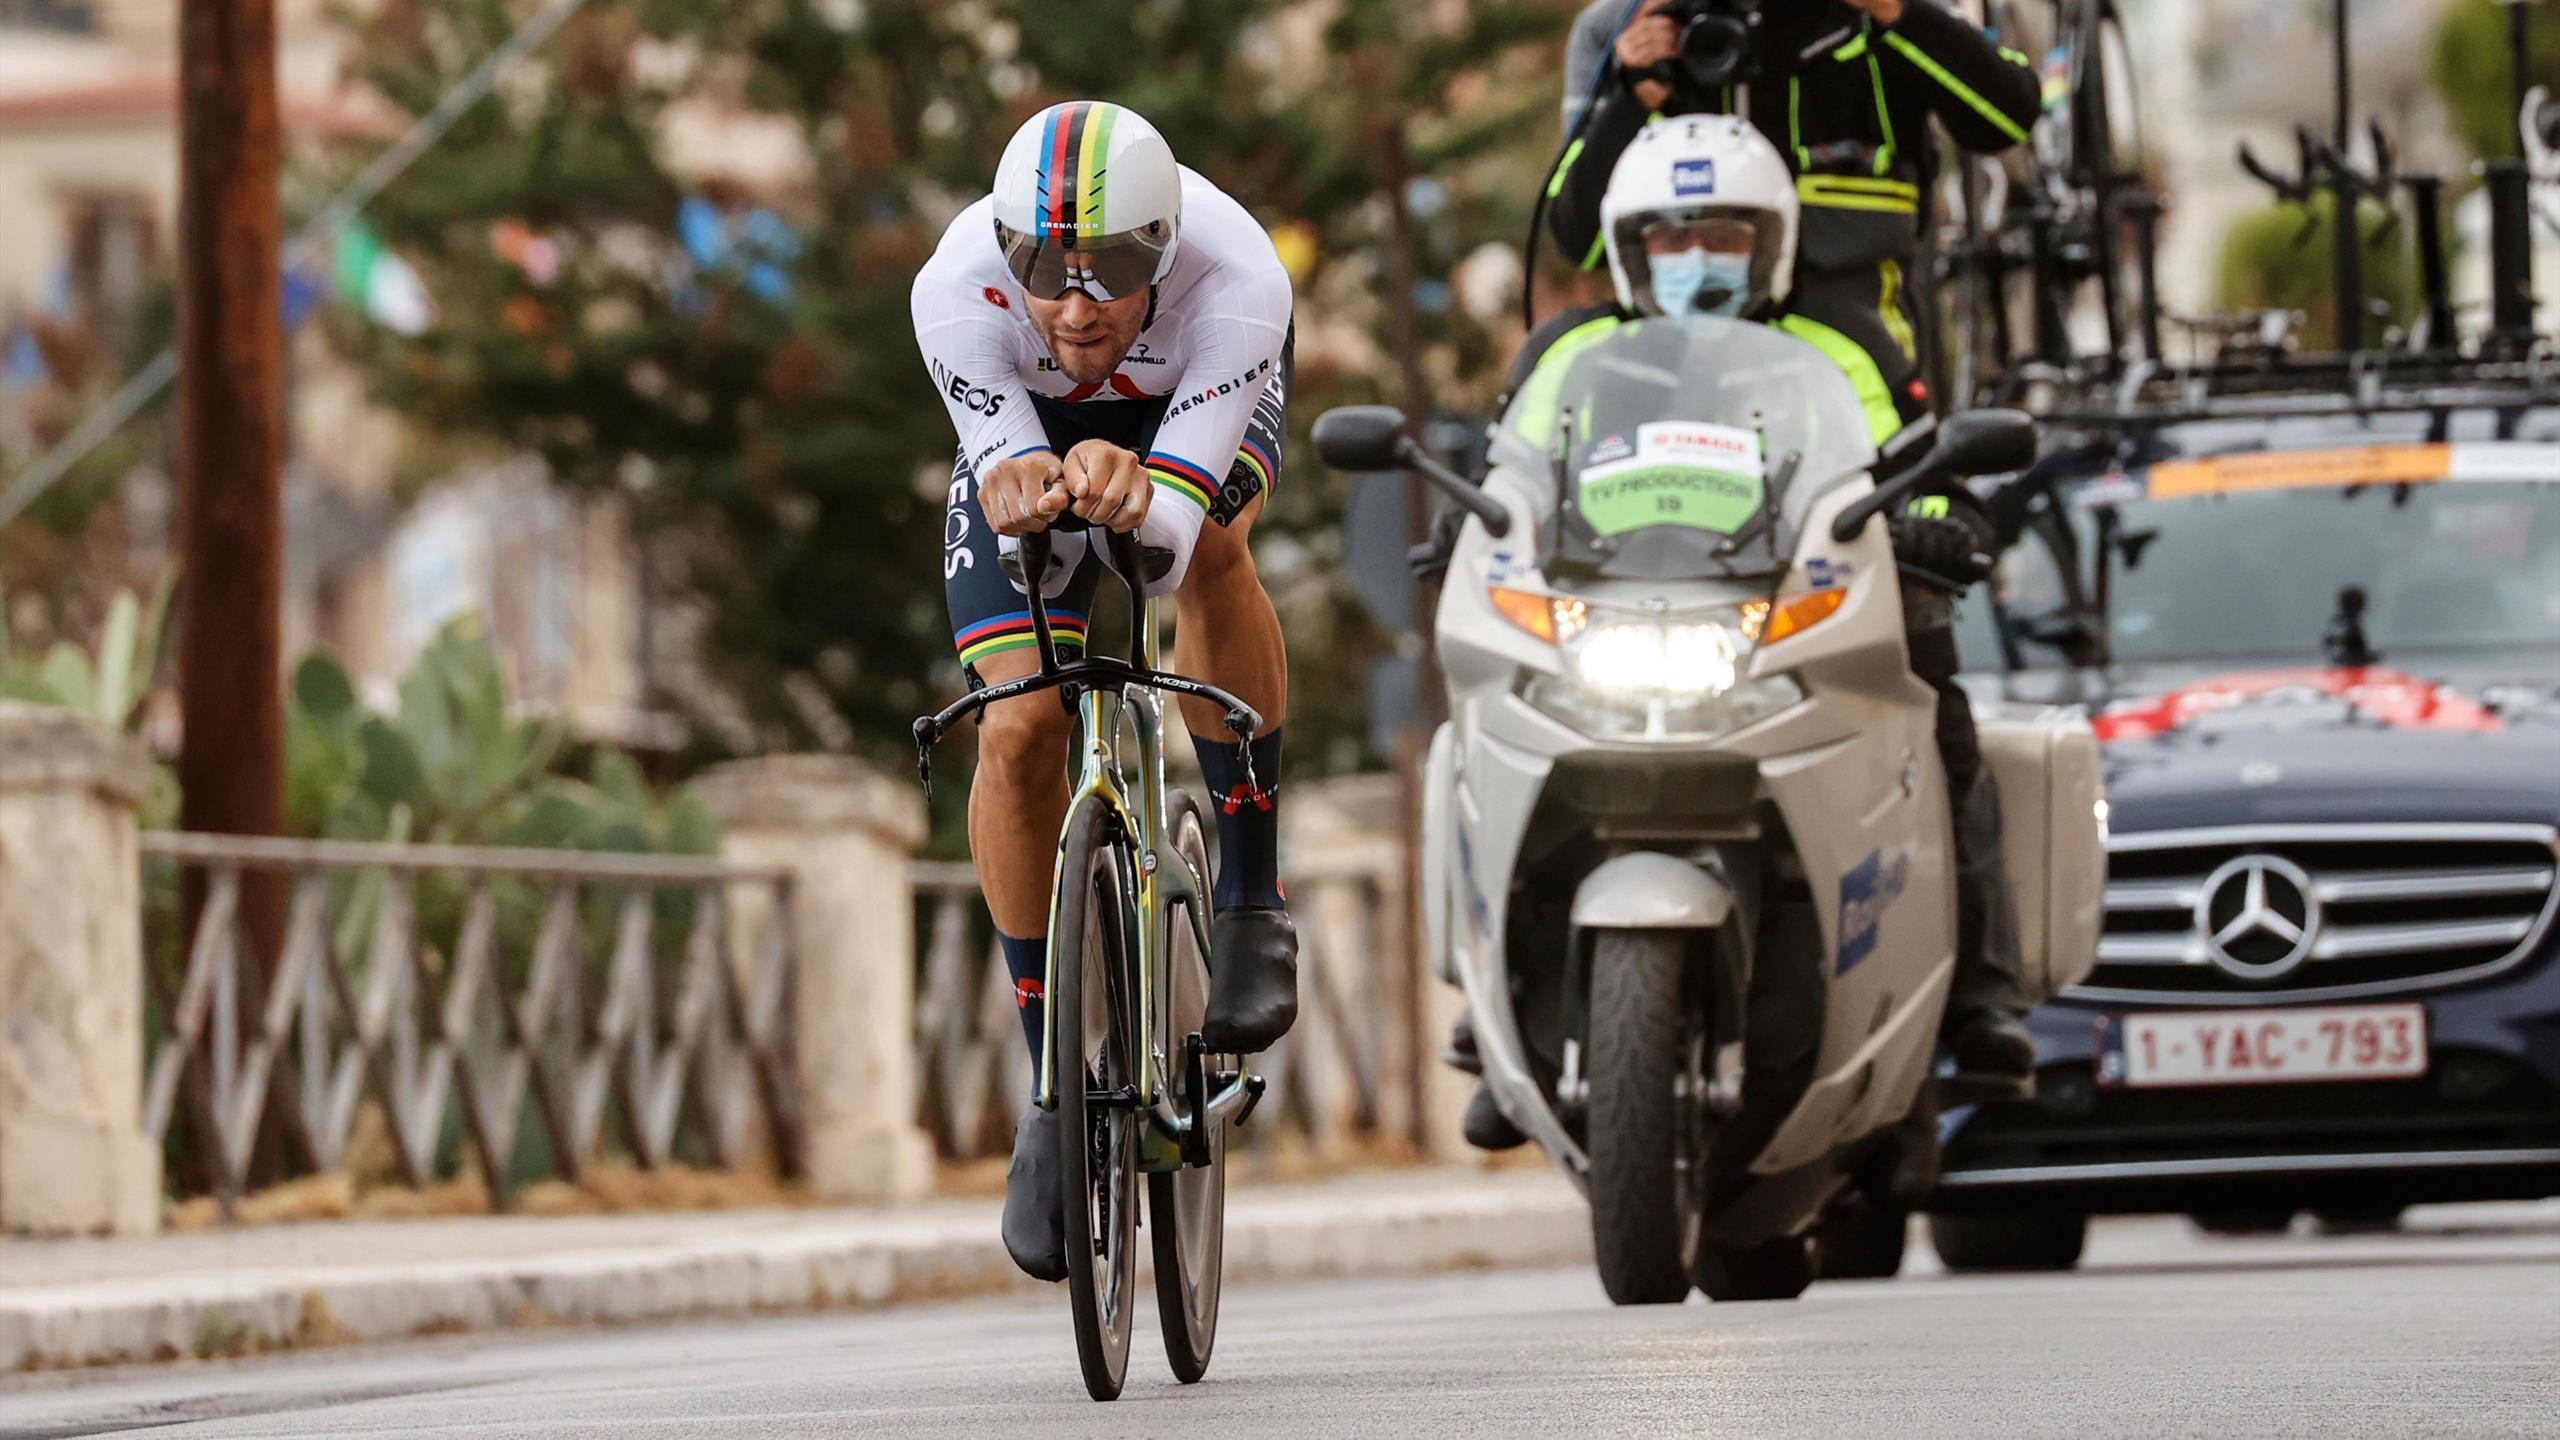 Giro d'Italia 2020 Stage 1 - As it happened